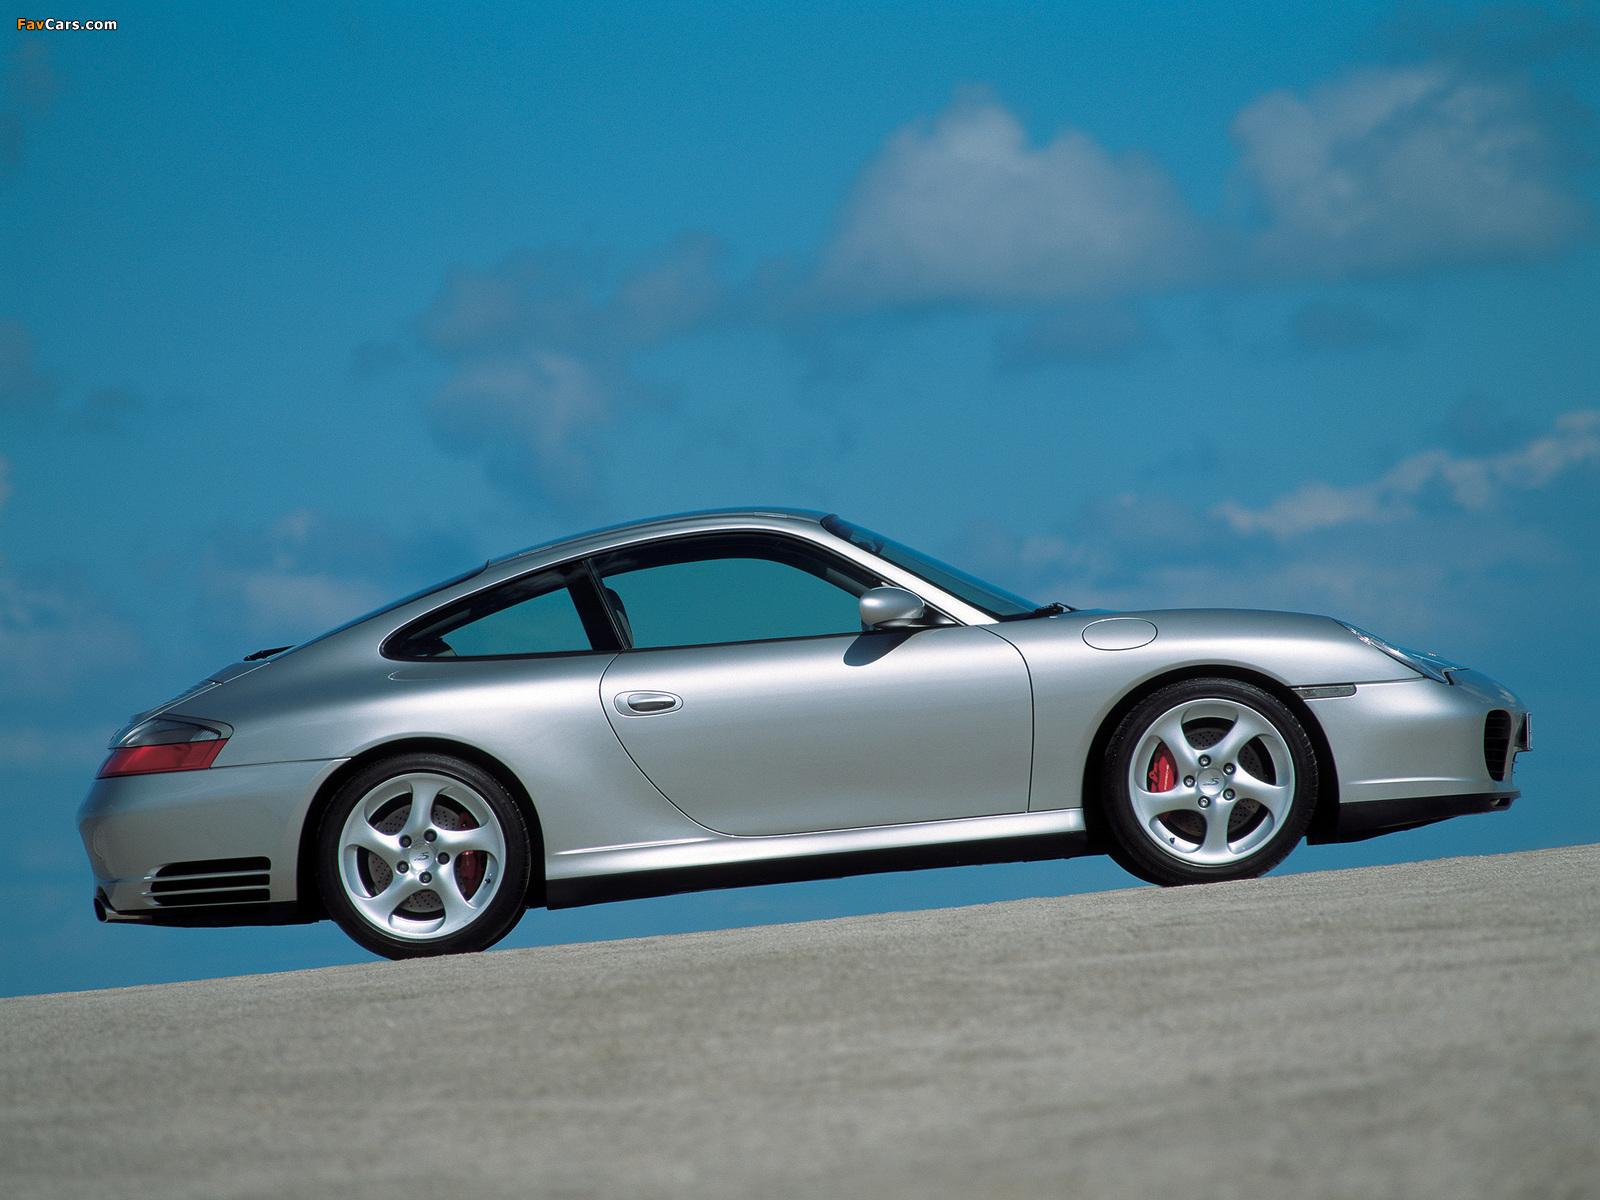 Porsche 911 Carrera 4s Coupe 996 2001 04 Wallpapers 1600x1200